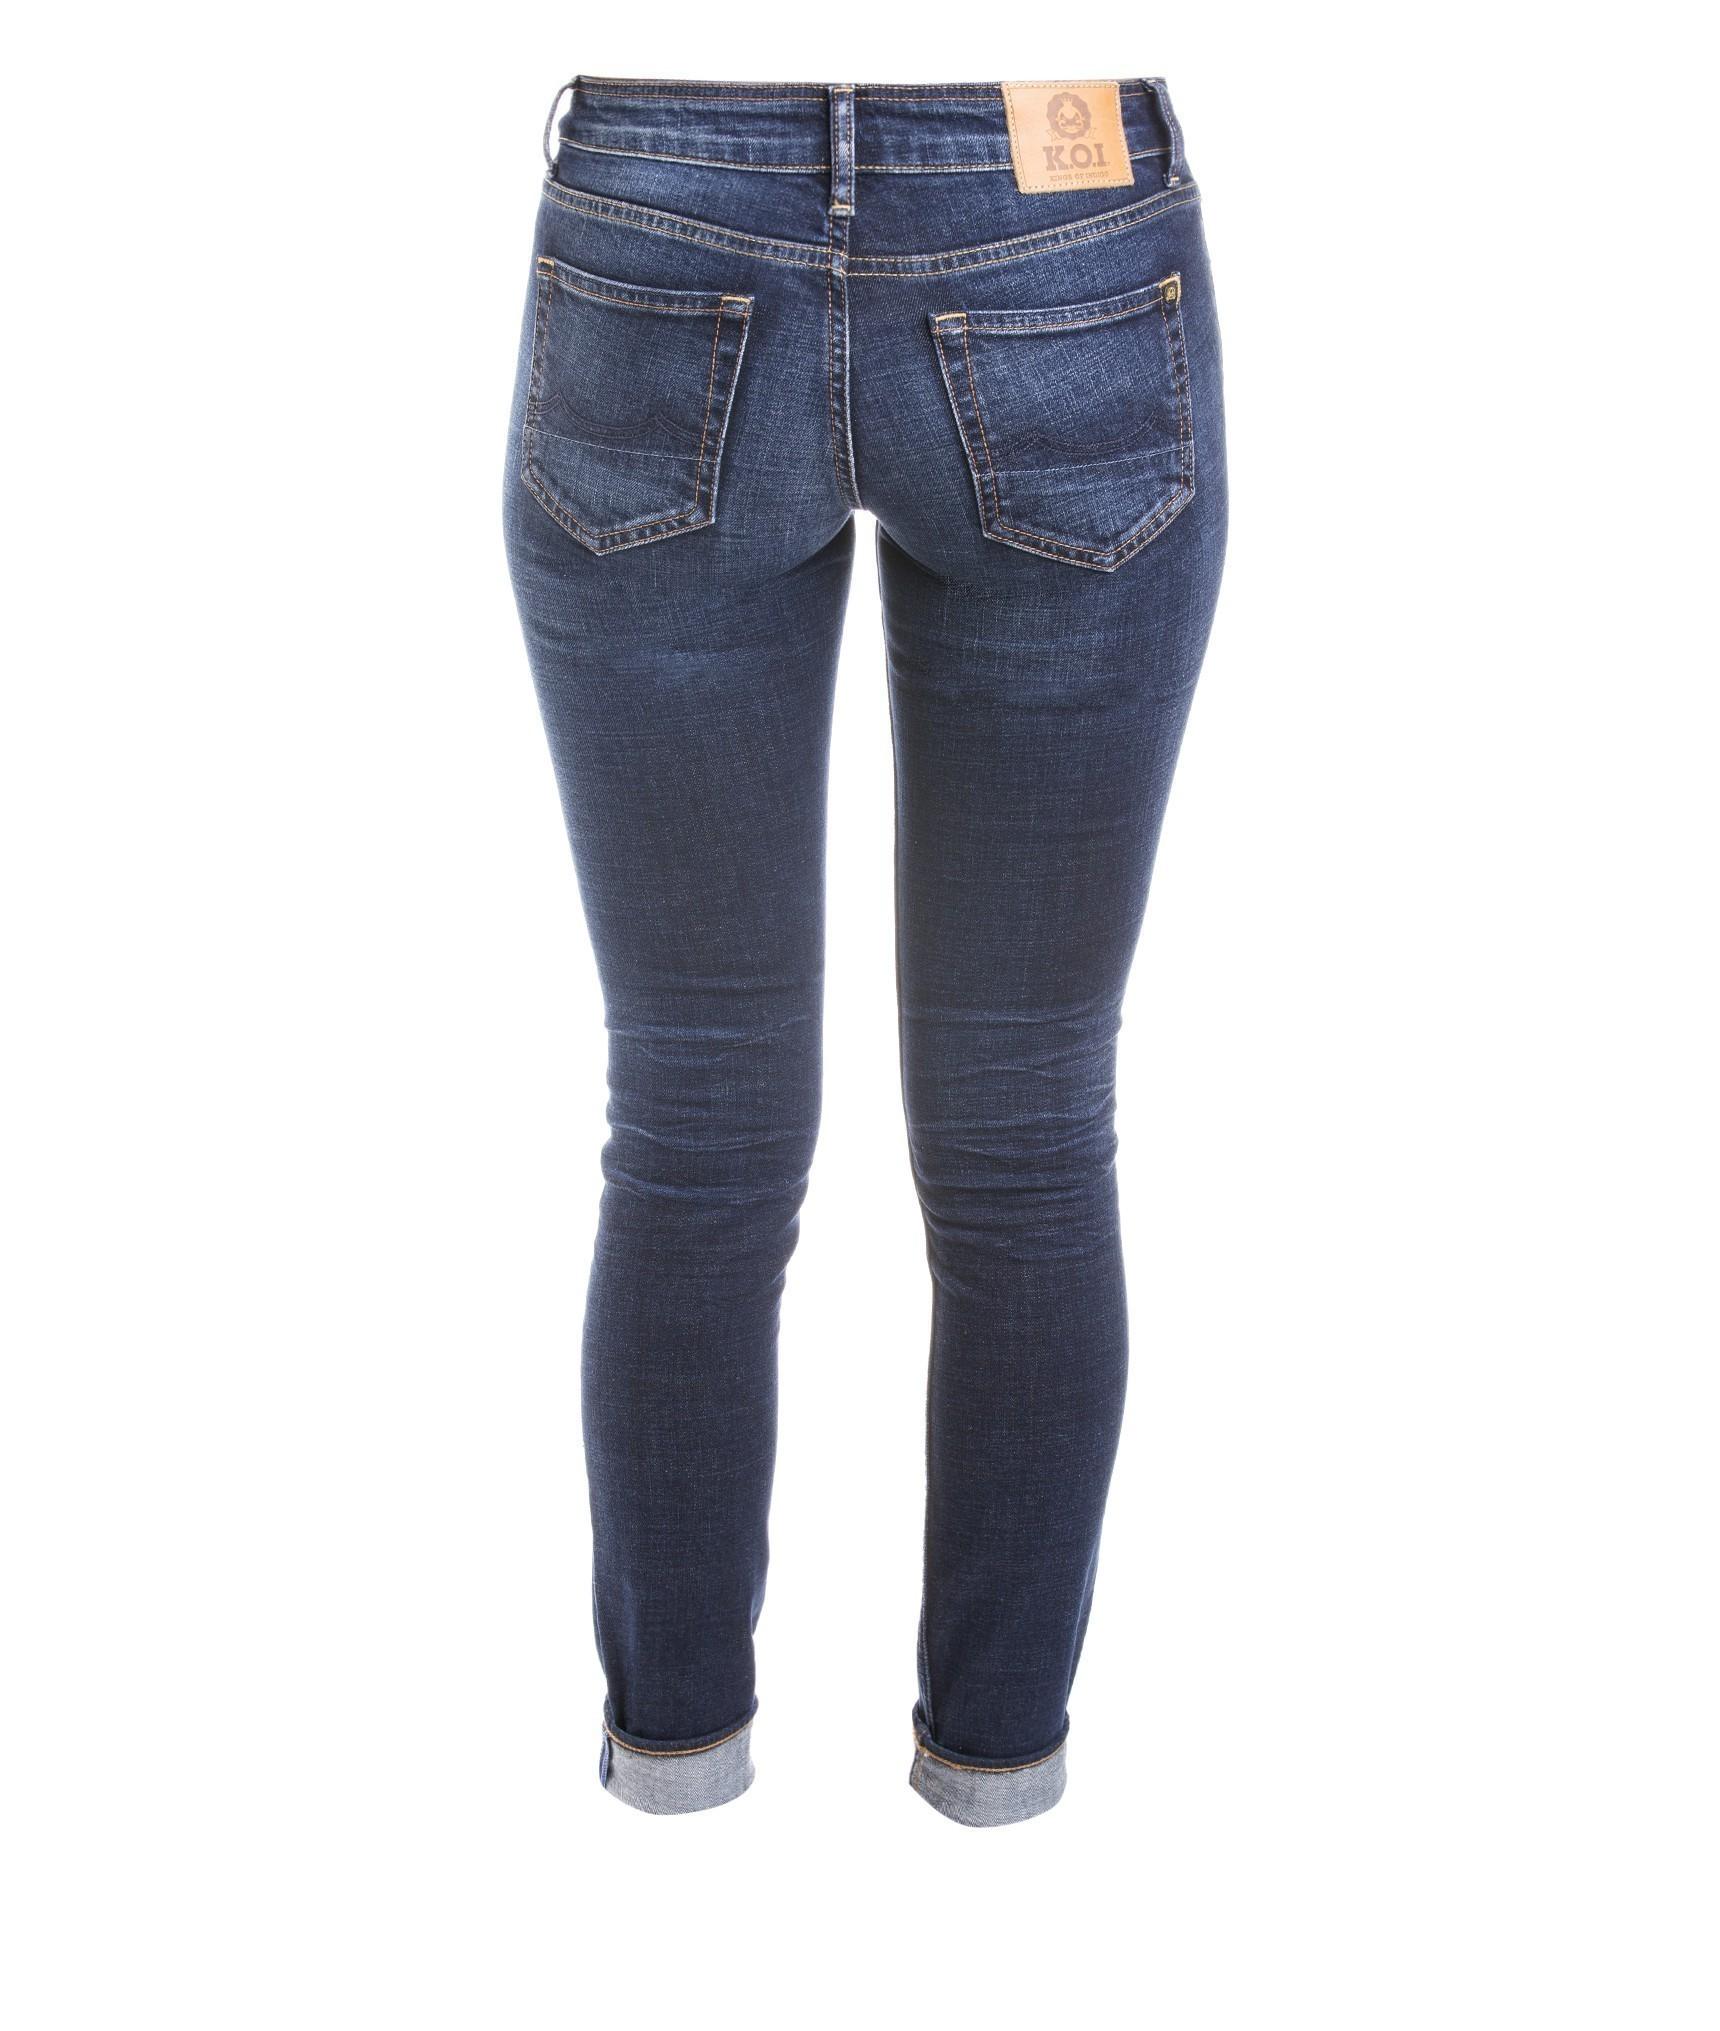 Kings of Indigo - K.O.I. Juno Dark Worn • Jeans Bio Jeans für Damen bei glore • glore